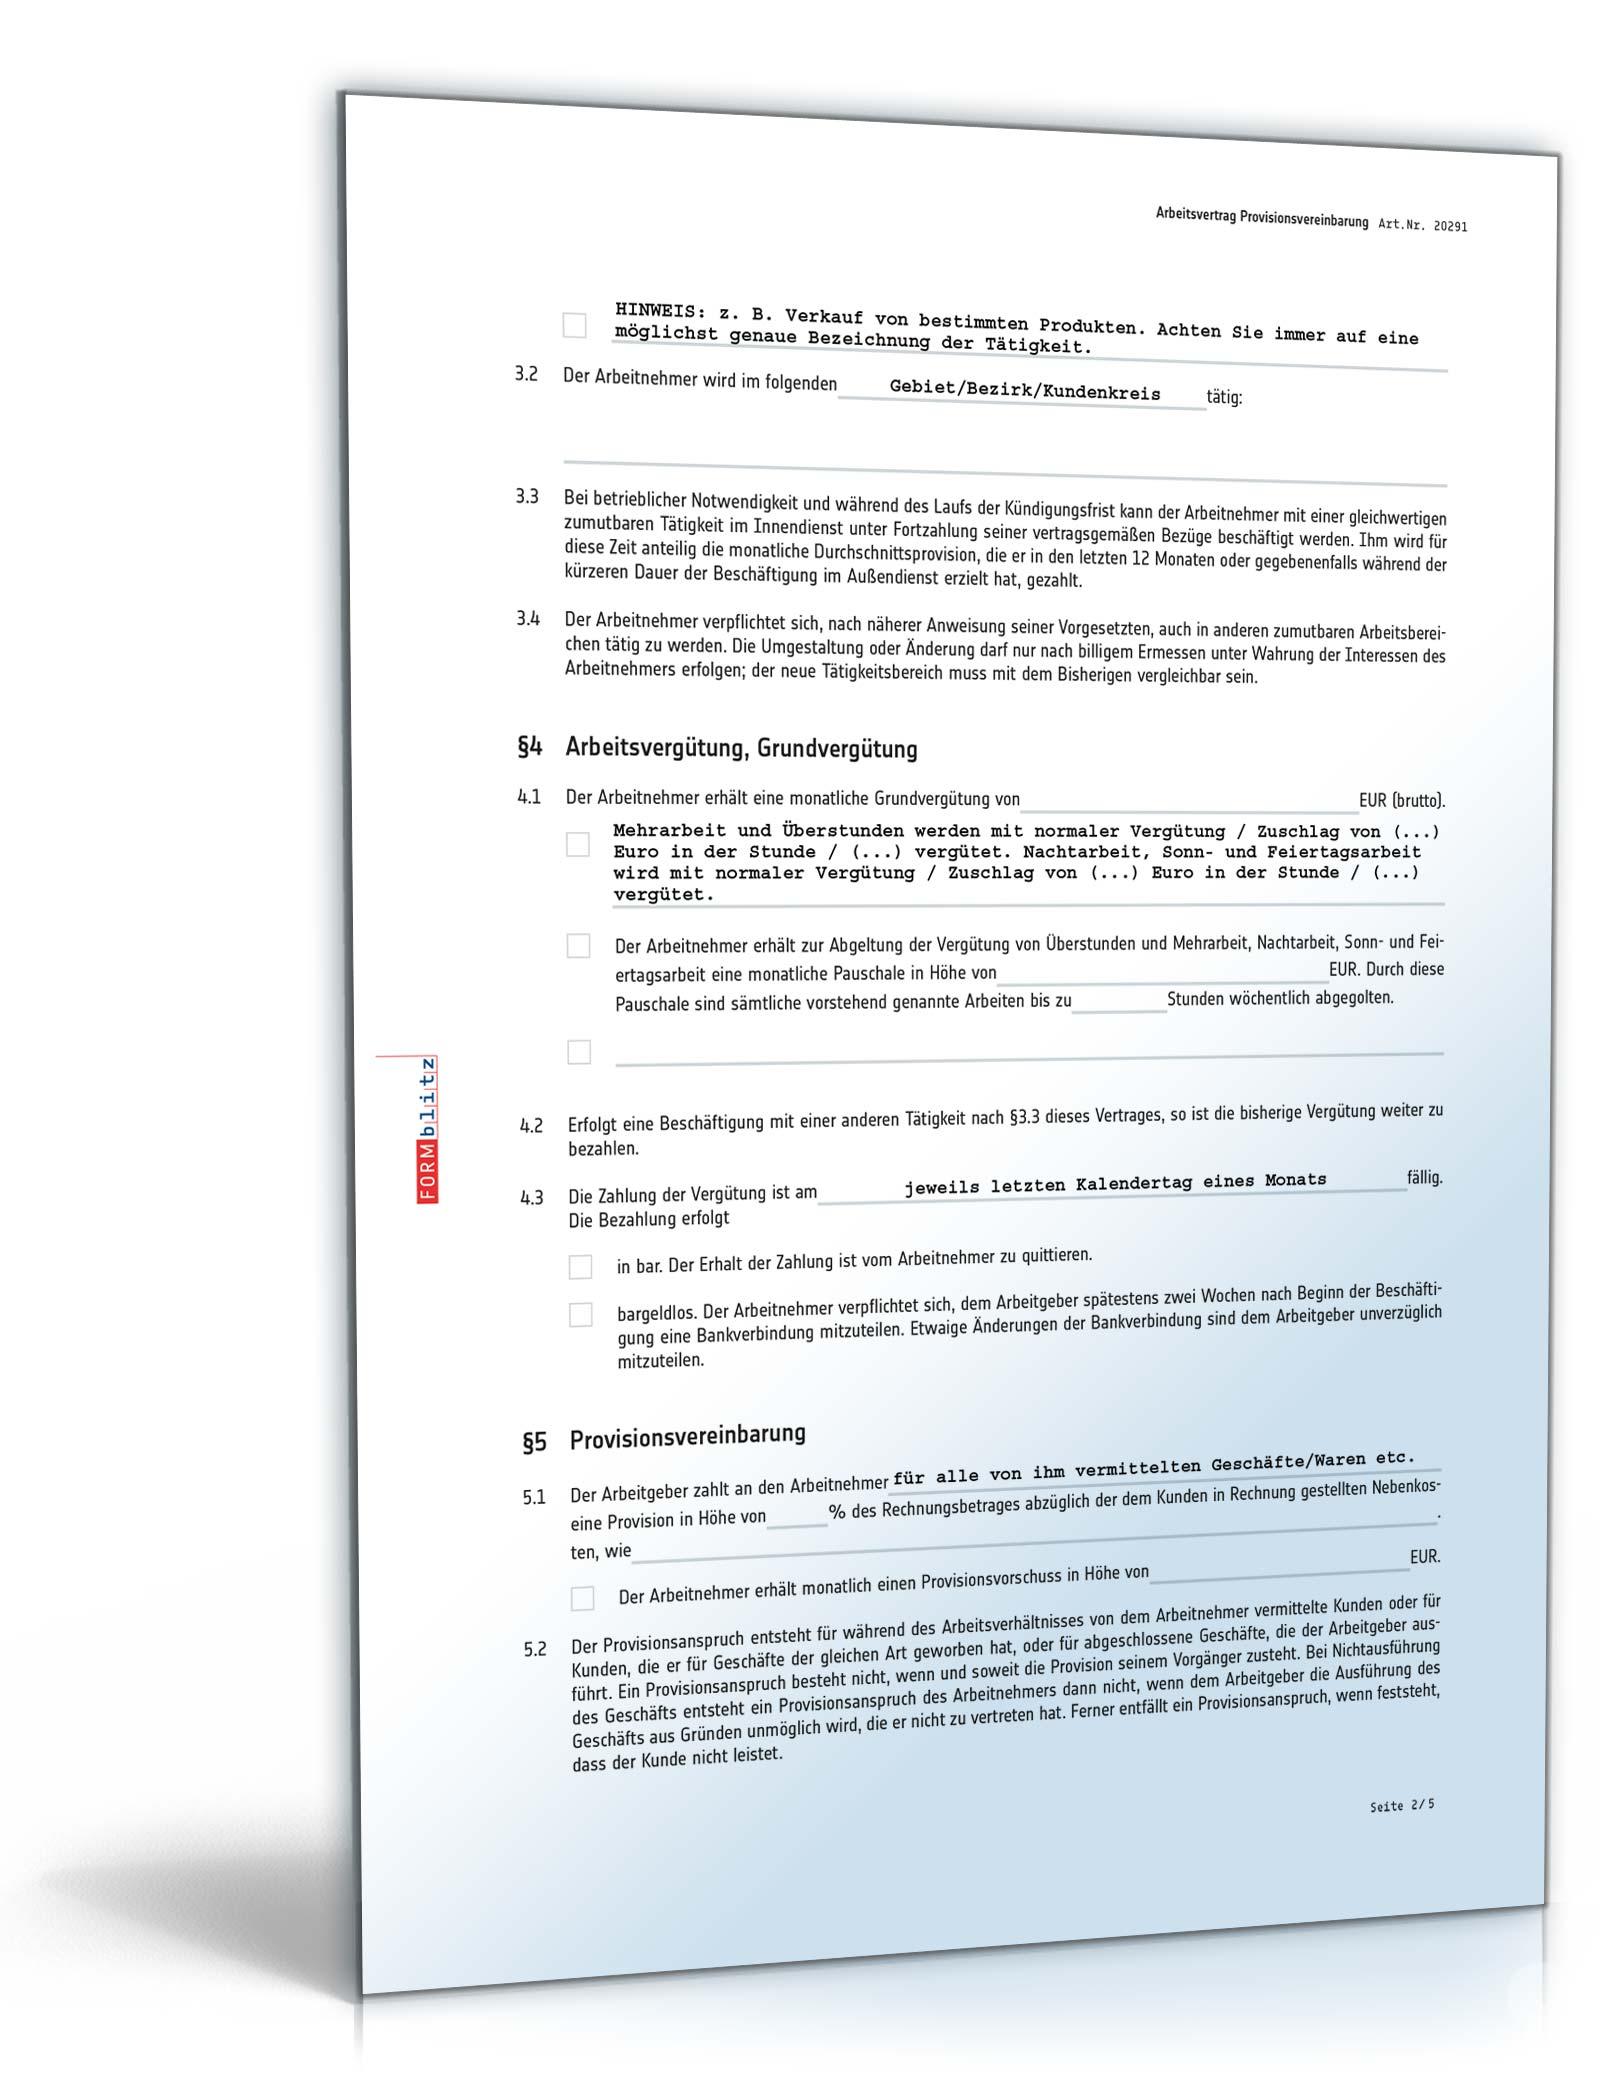 arbeitsvertrag provisionsvereinbarung pdf seite 02 - Provisionsvereinbarung Muster